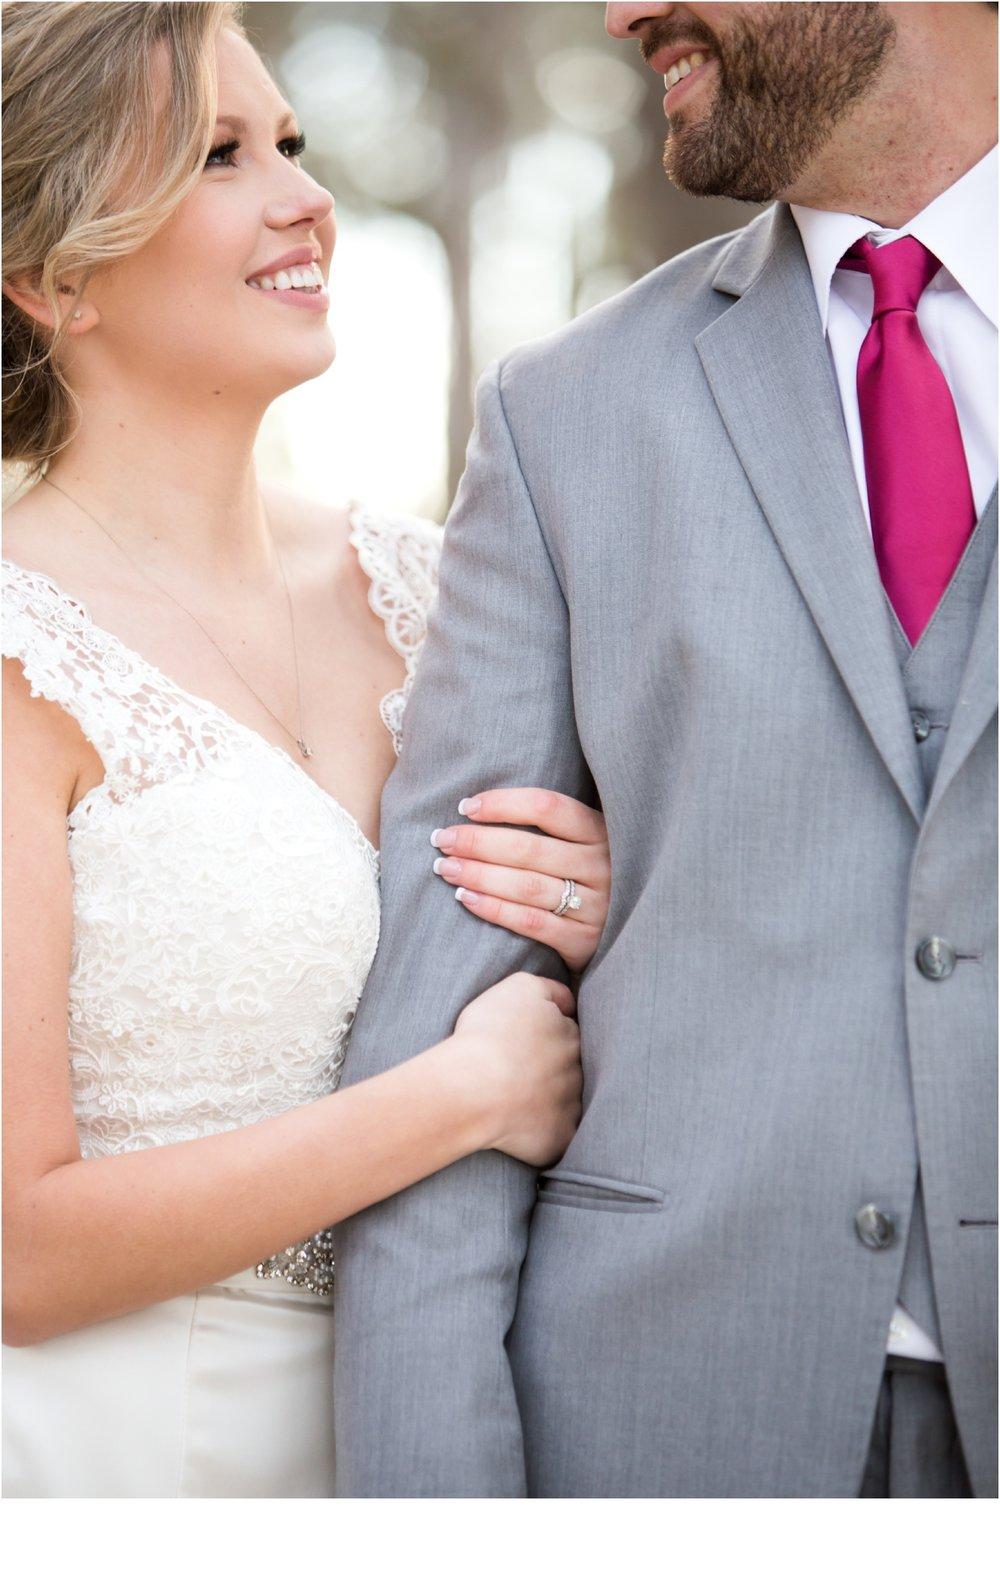 Rainey_Gregg_Photography_St._Simons_Island_Georgia_California_Wedding_Portrait_Photography_0496.jpg